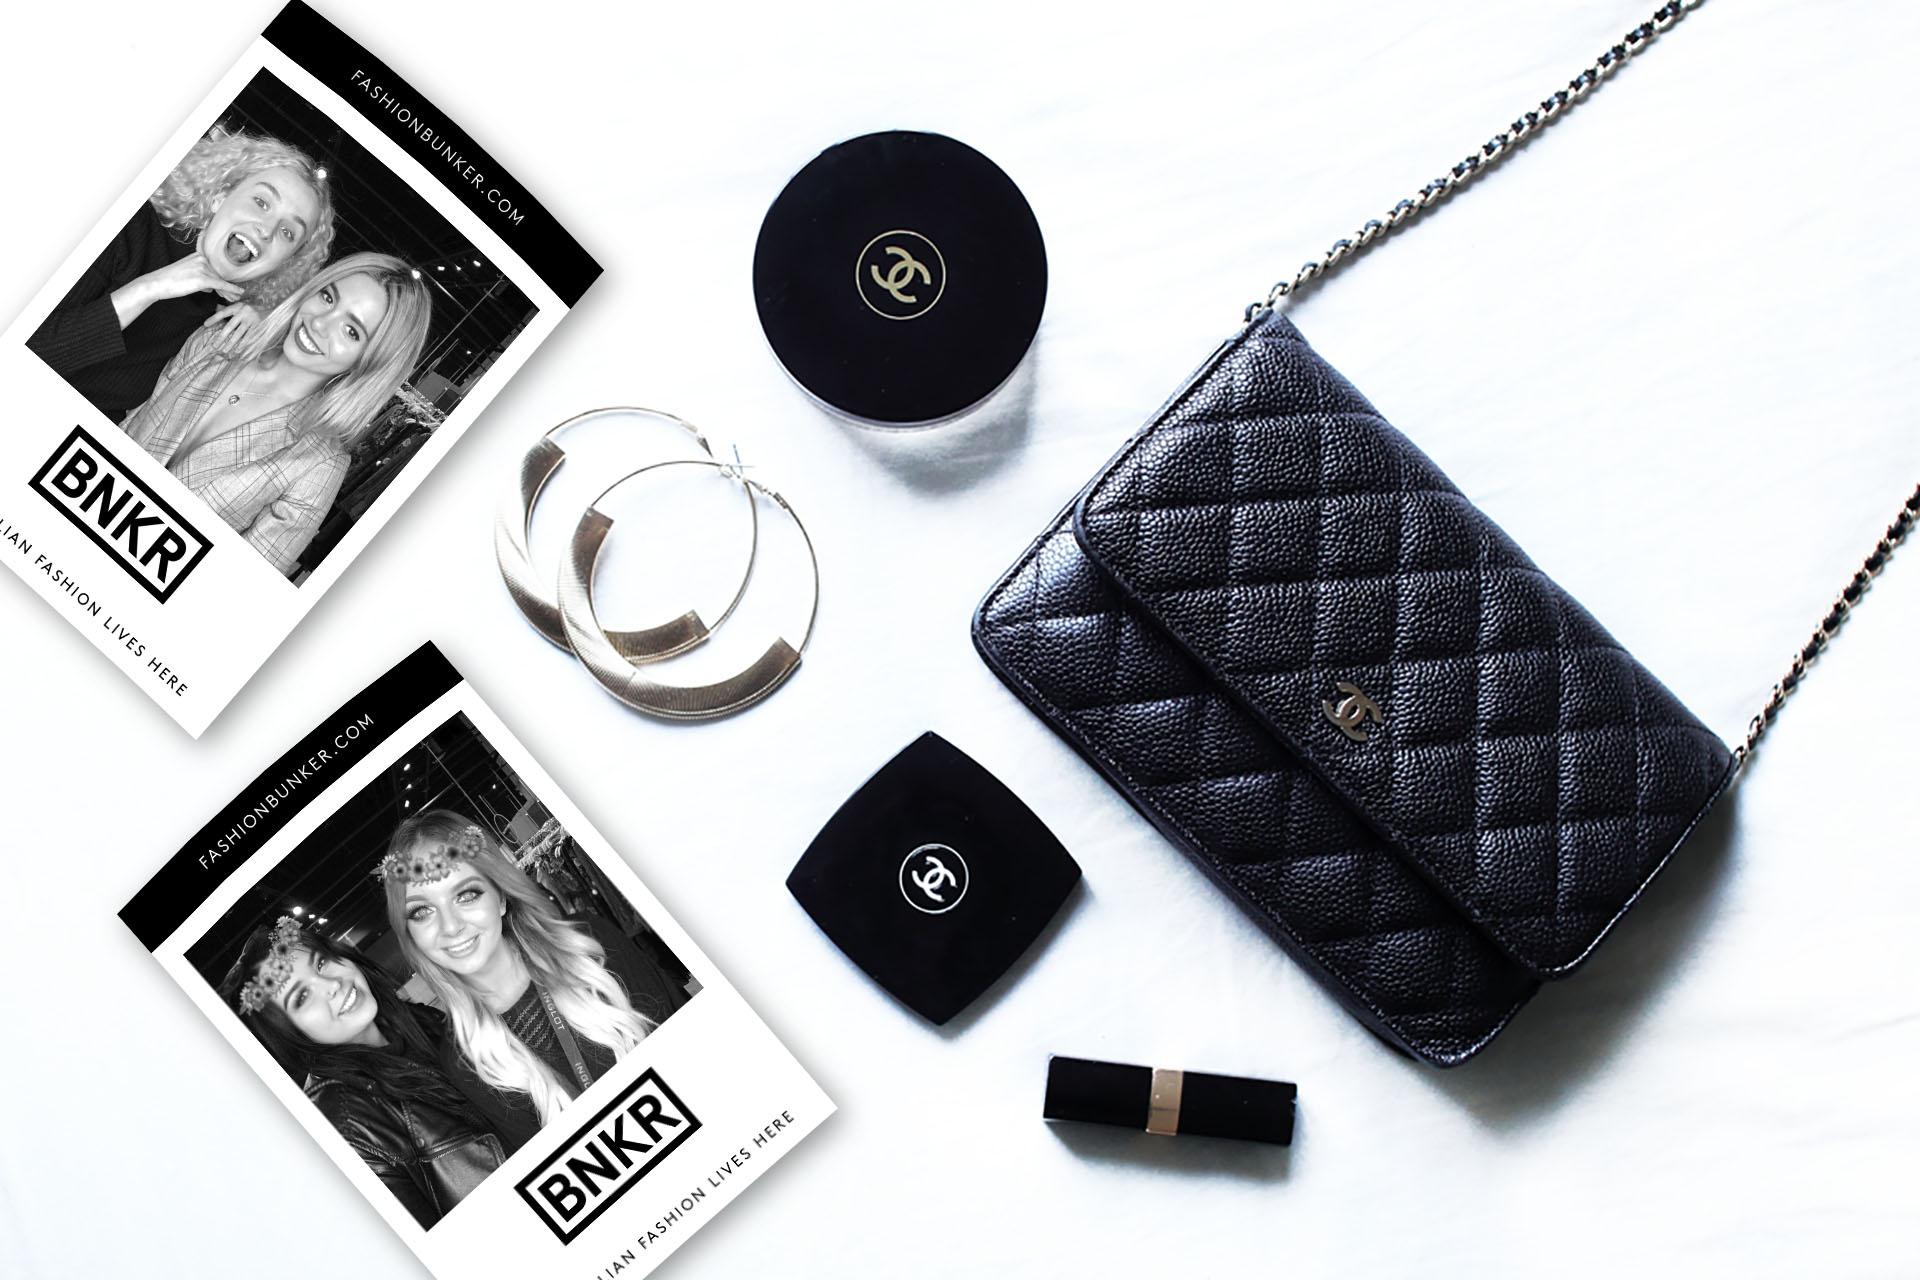 Chanel & BNKR